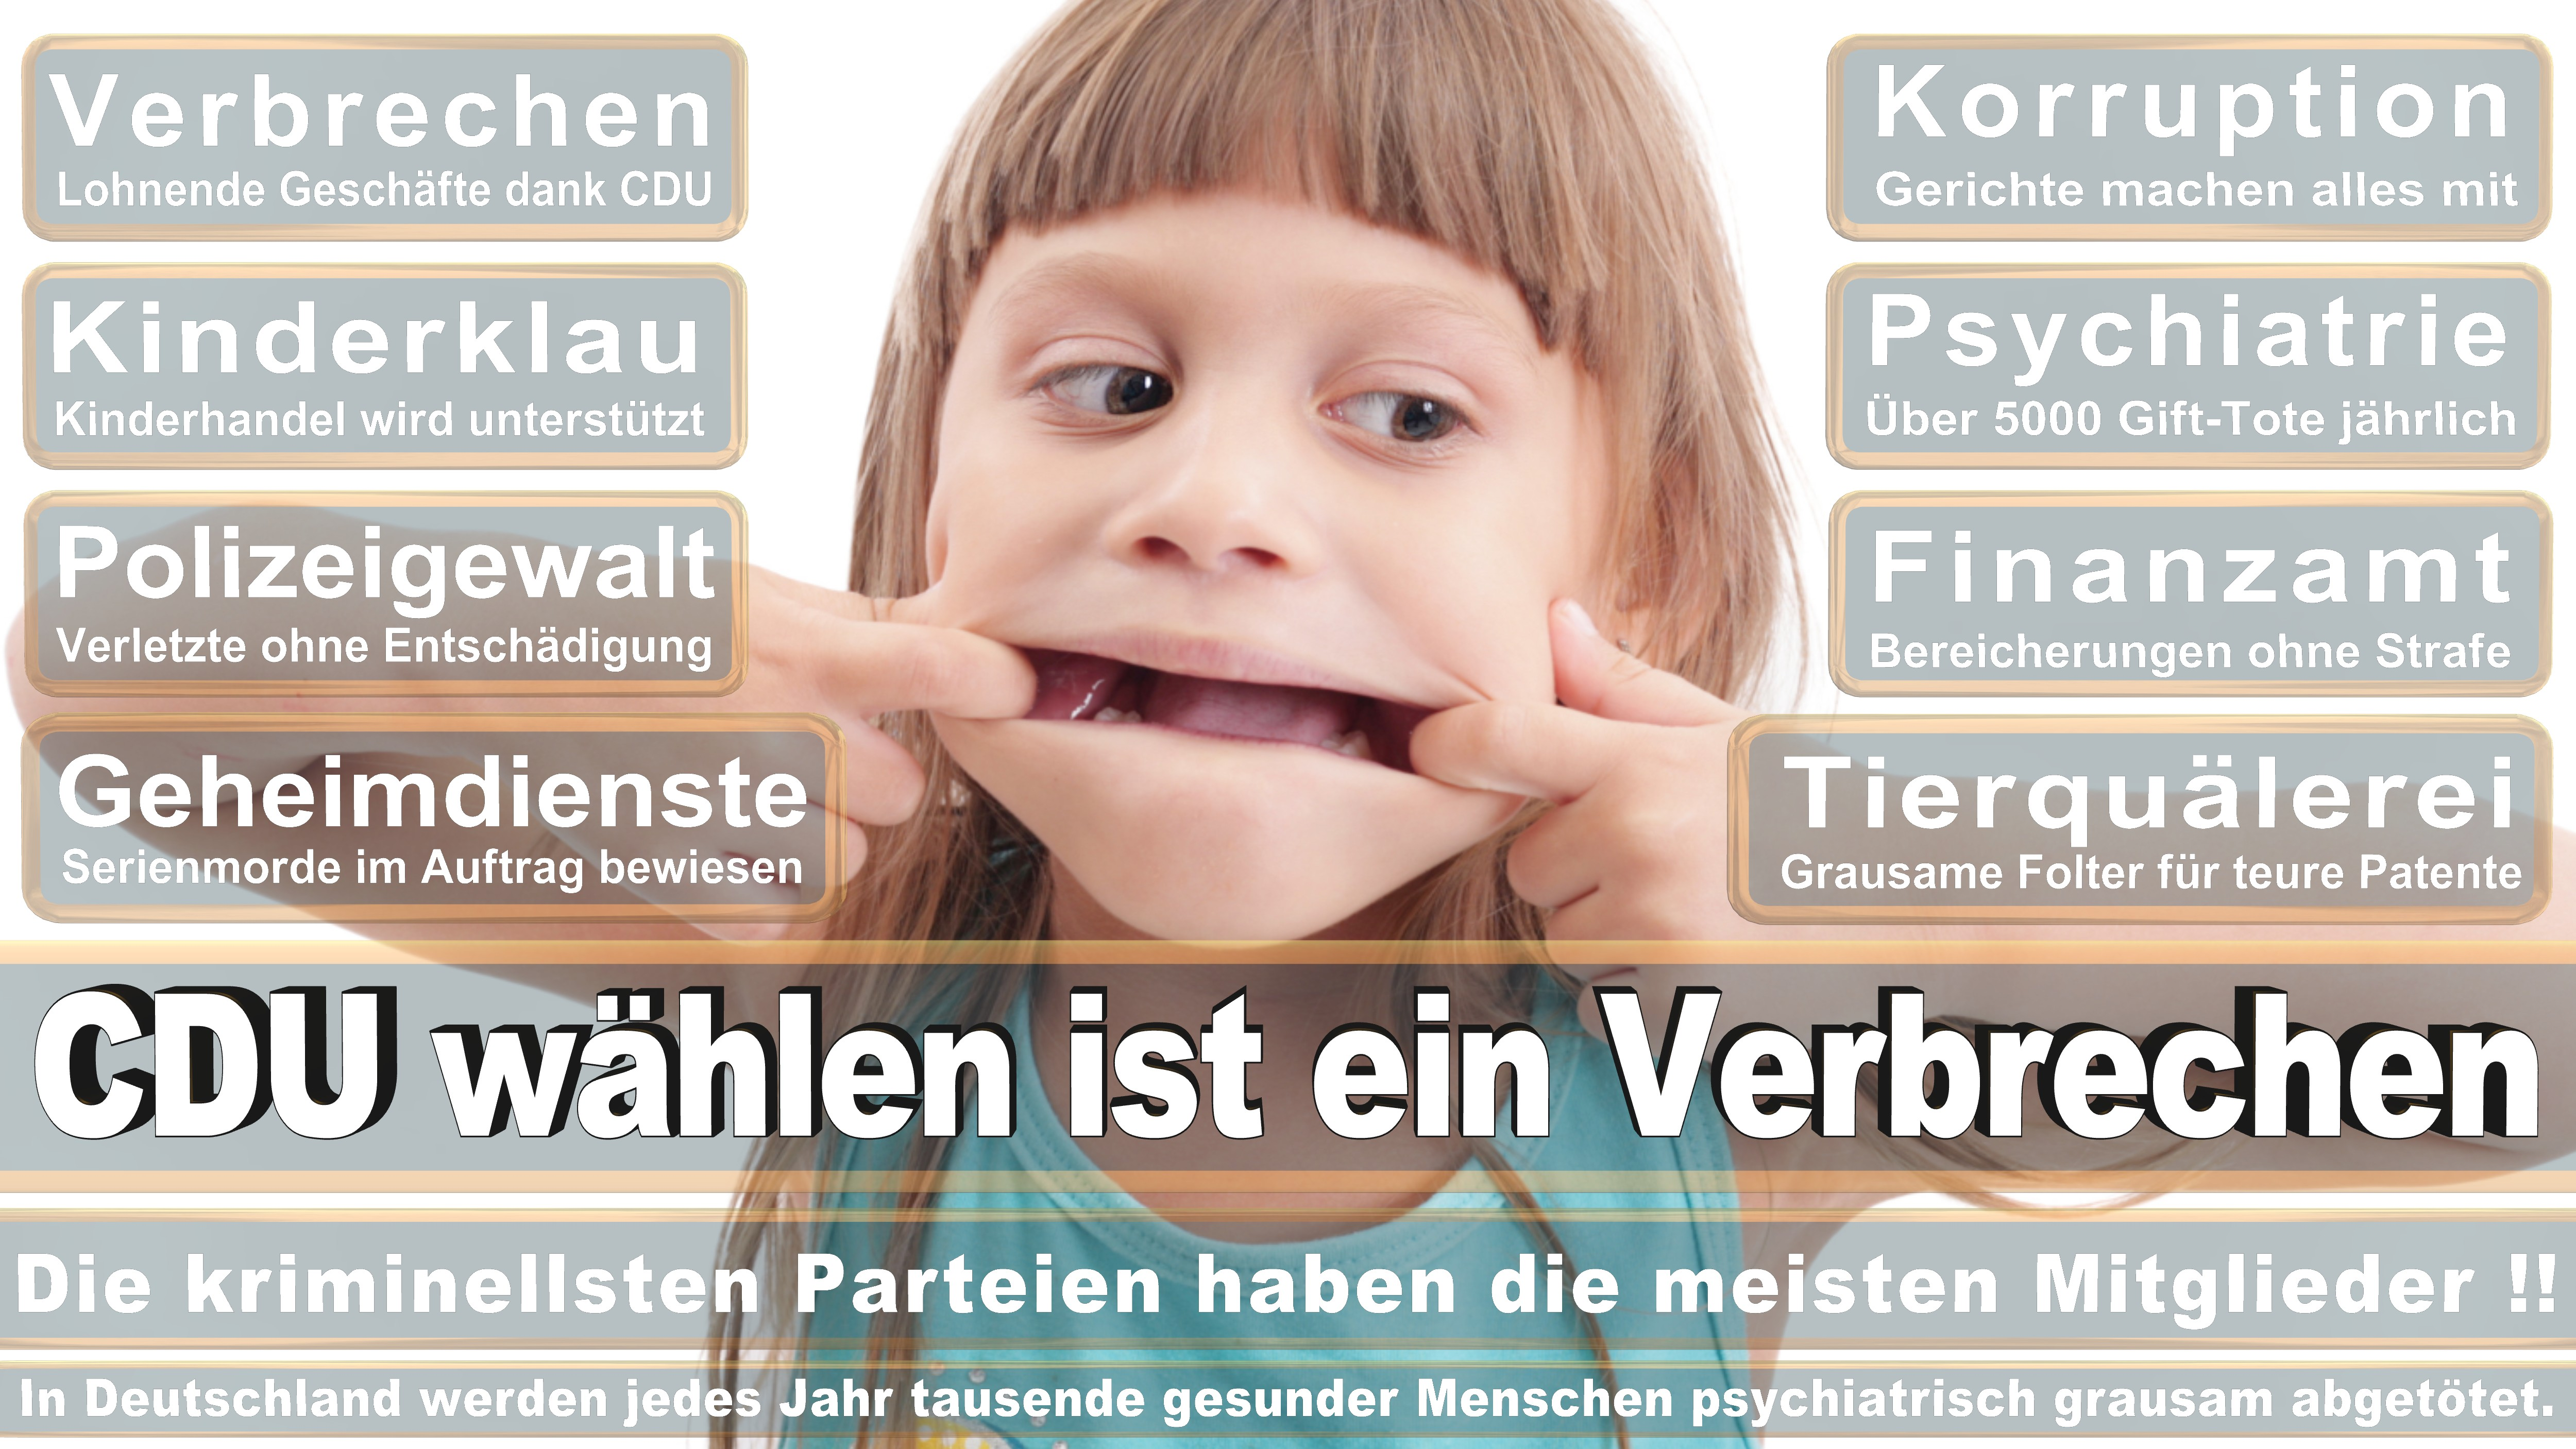 Ursula Groden Kranich CDU CSU Politiker